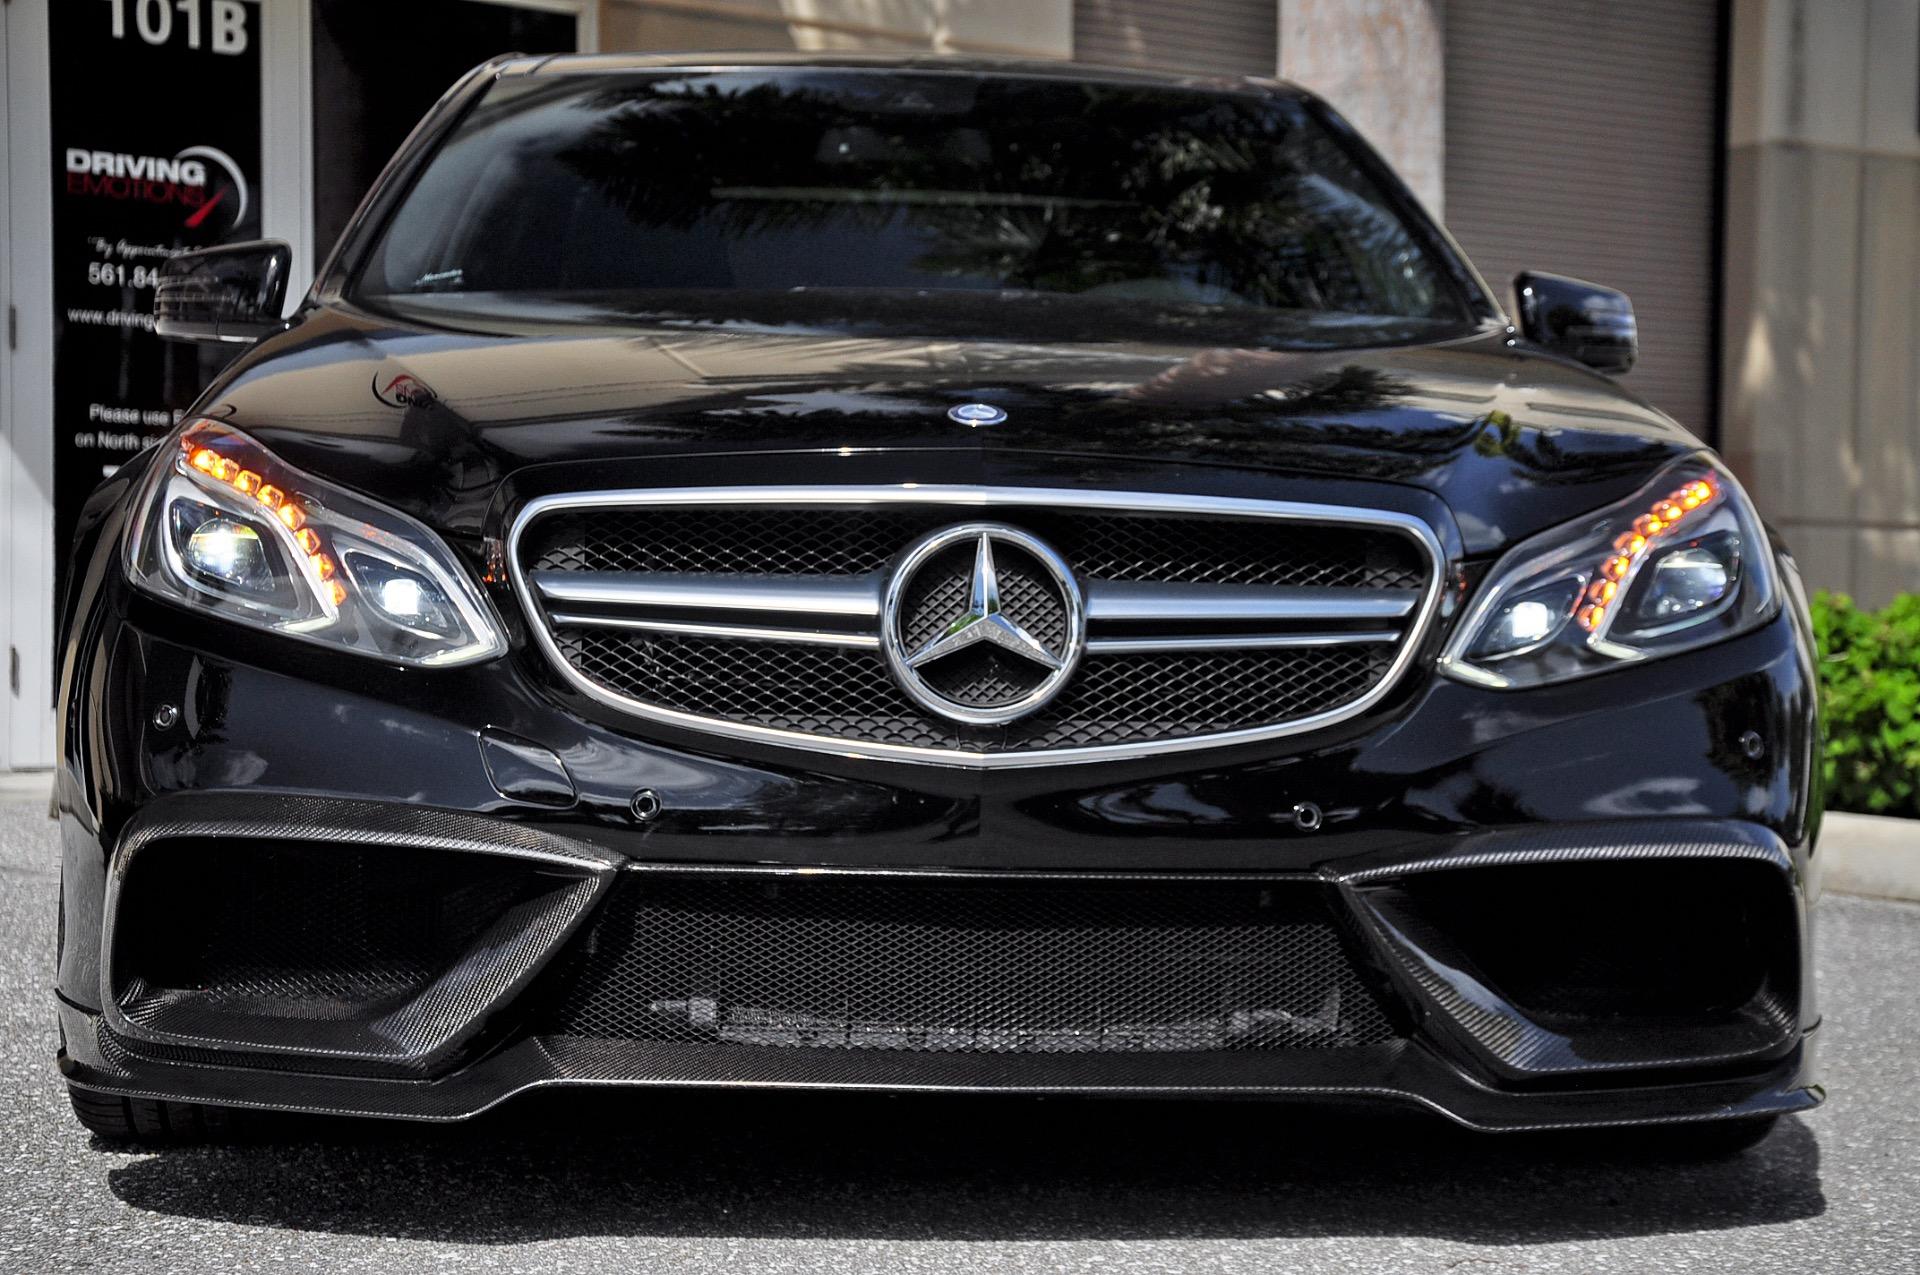 Black 2014 Mercedes-Benz E63 AMG S